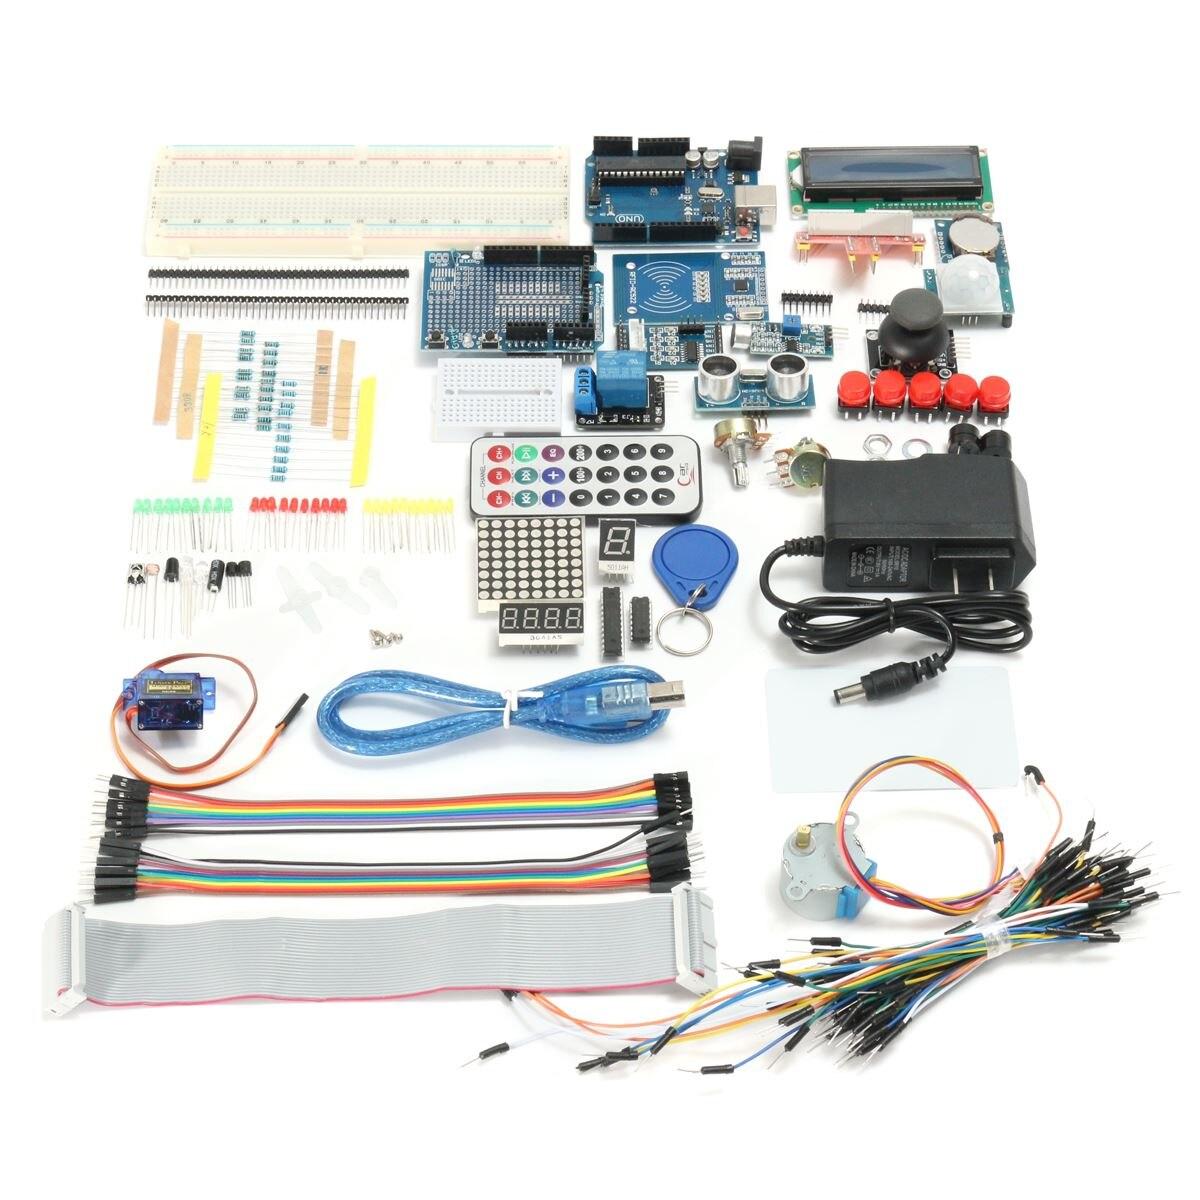 Новый электронный набор Полное издание UNO R3 Starter Kit для Arduino 1602LCD RFID реле сервопривода PIR адаптер